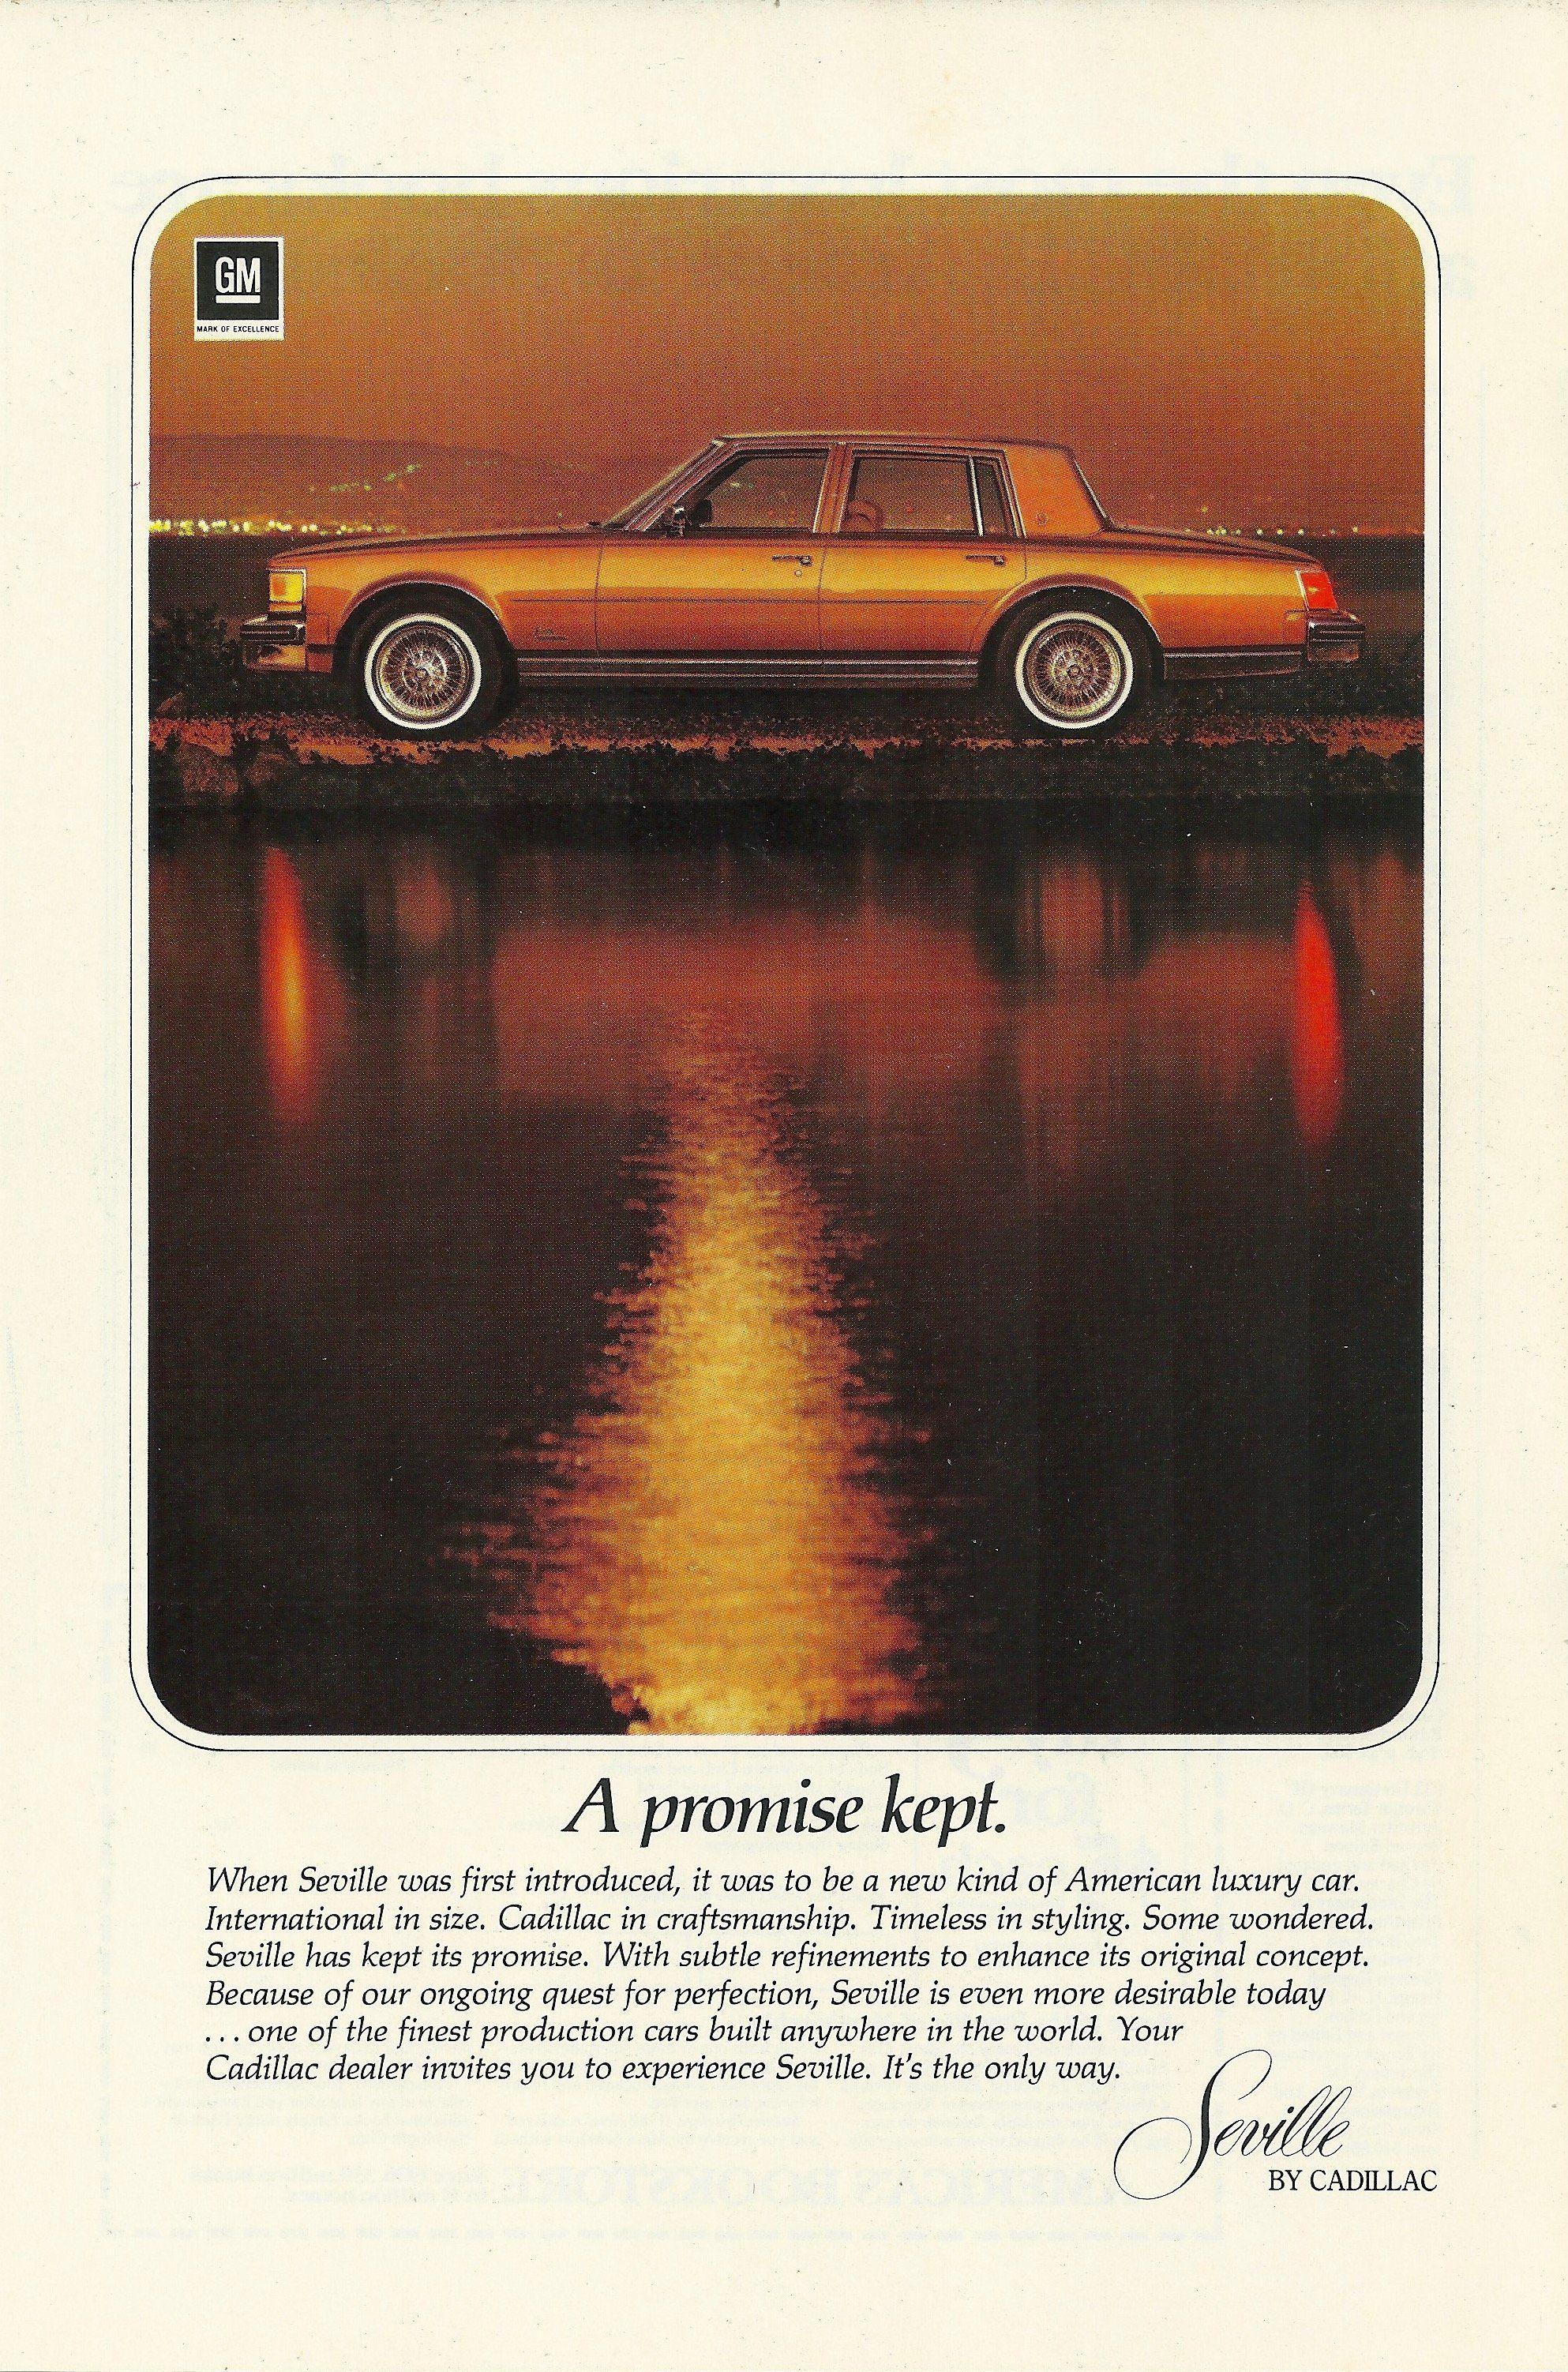 1978 Cadillac Seville Promise Kept Vintage Print Ad Masarati 2018